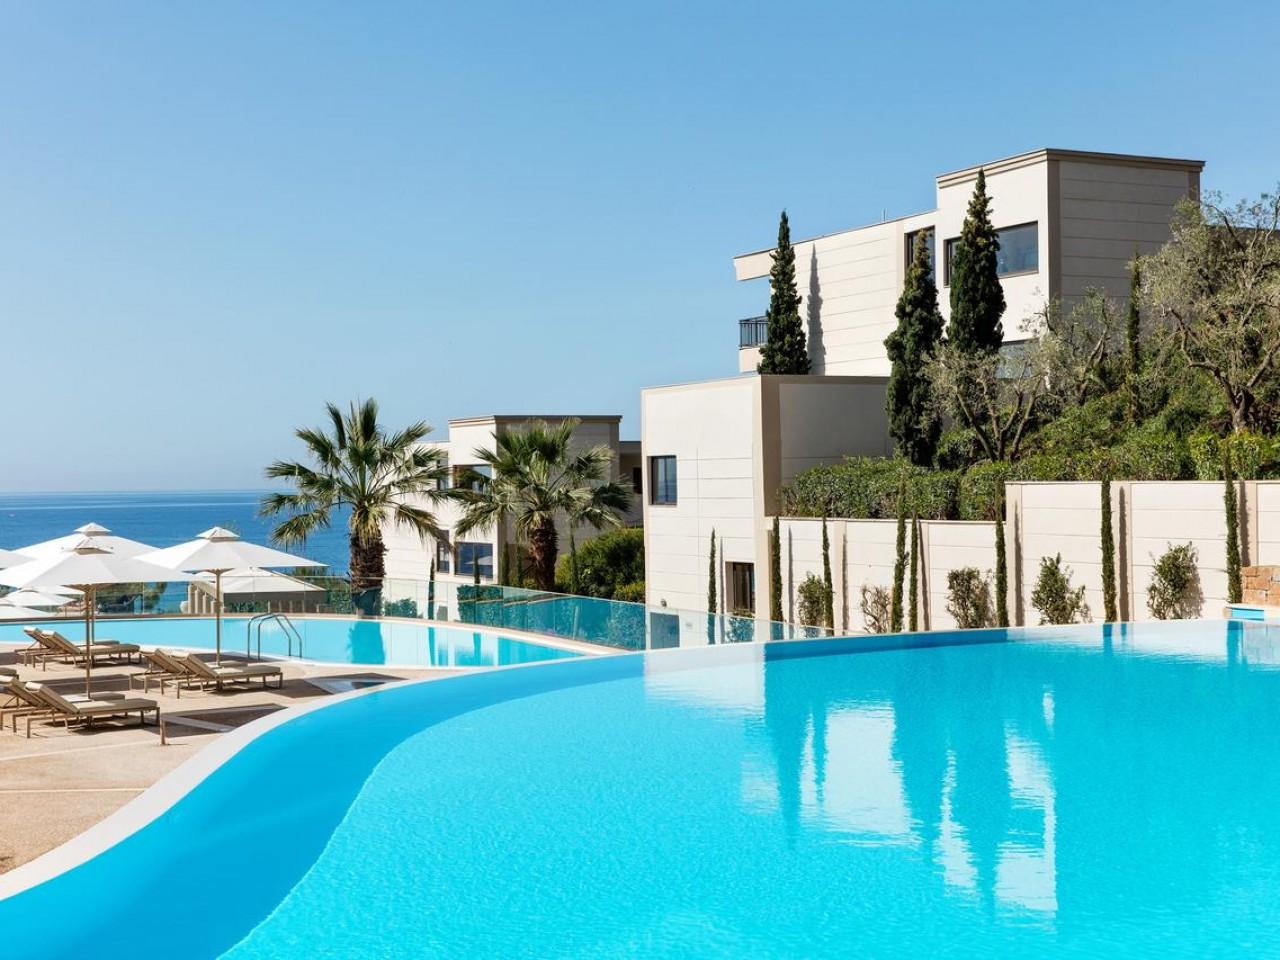 Hotels in Halkidiki